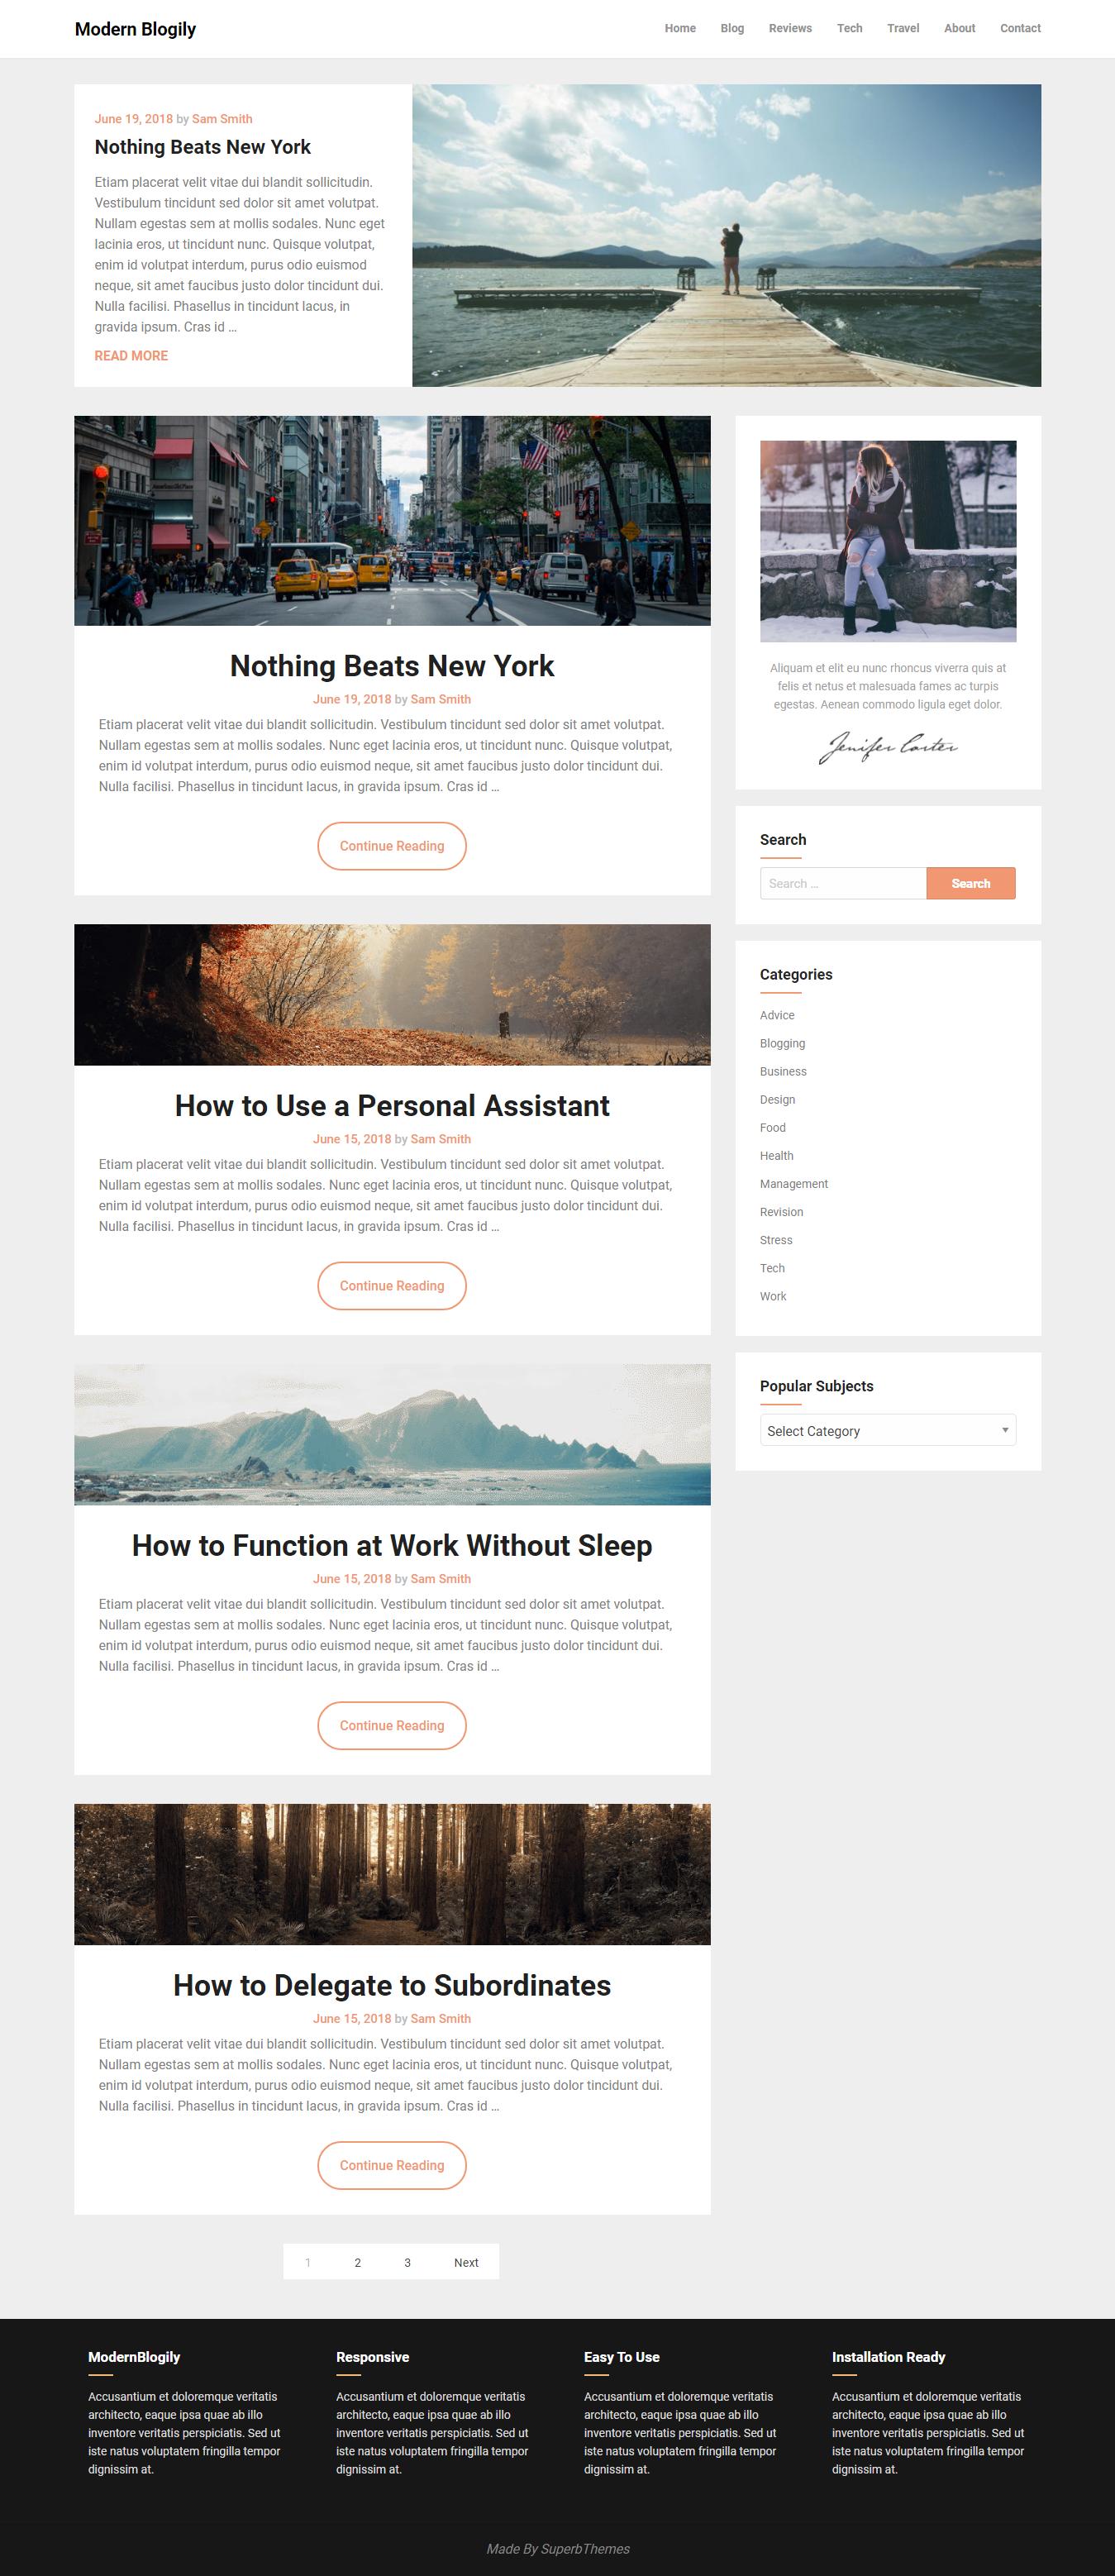 modern blogily best free minimal wordpress theme - 10+ Best Free Minimal WordPress Themes